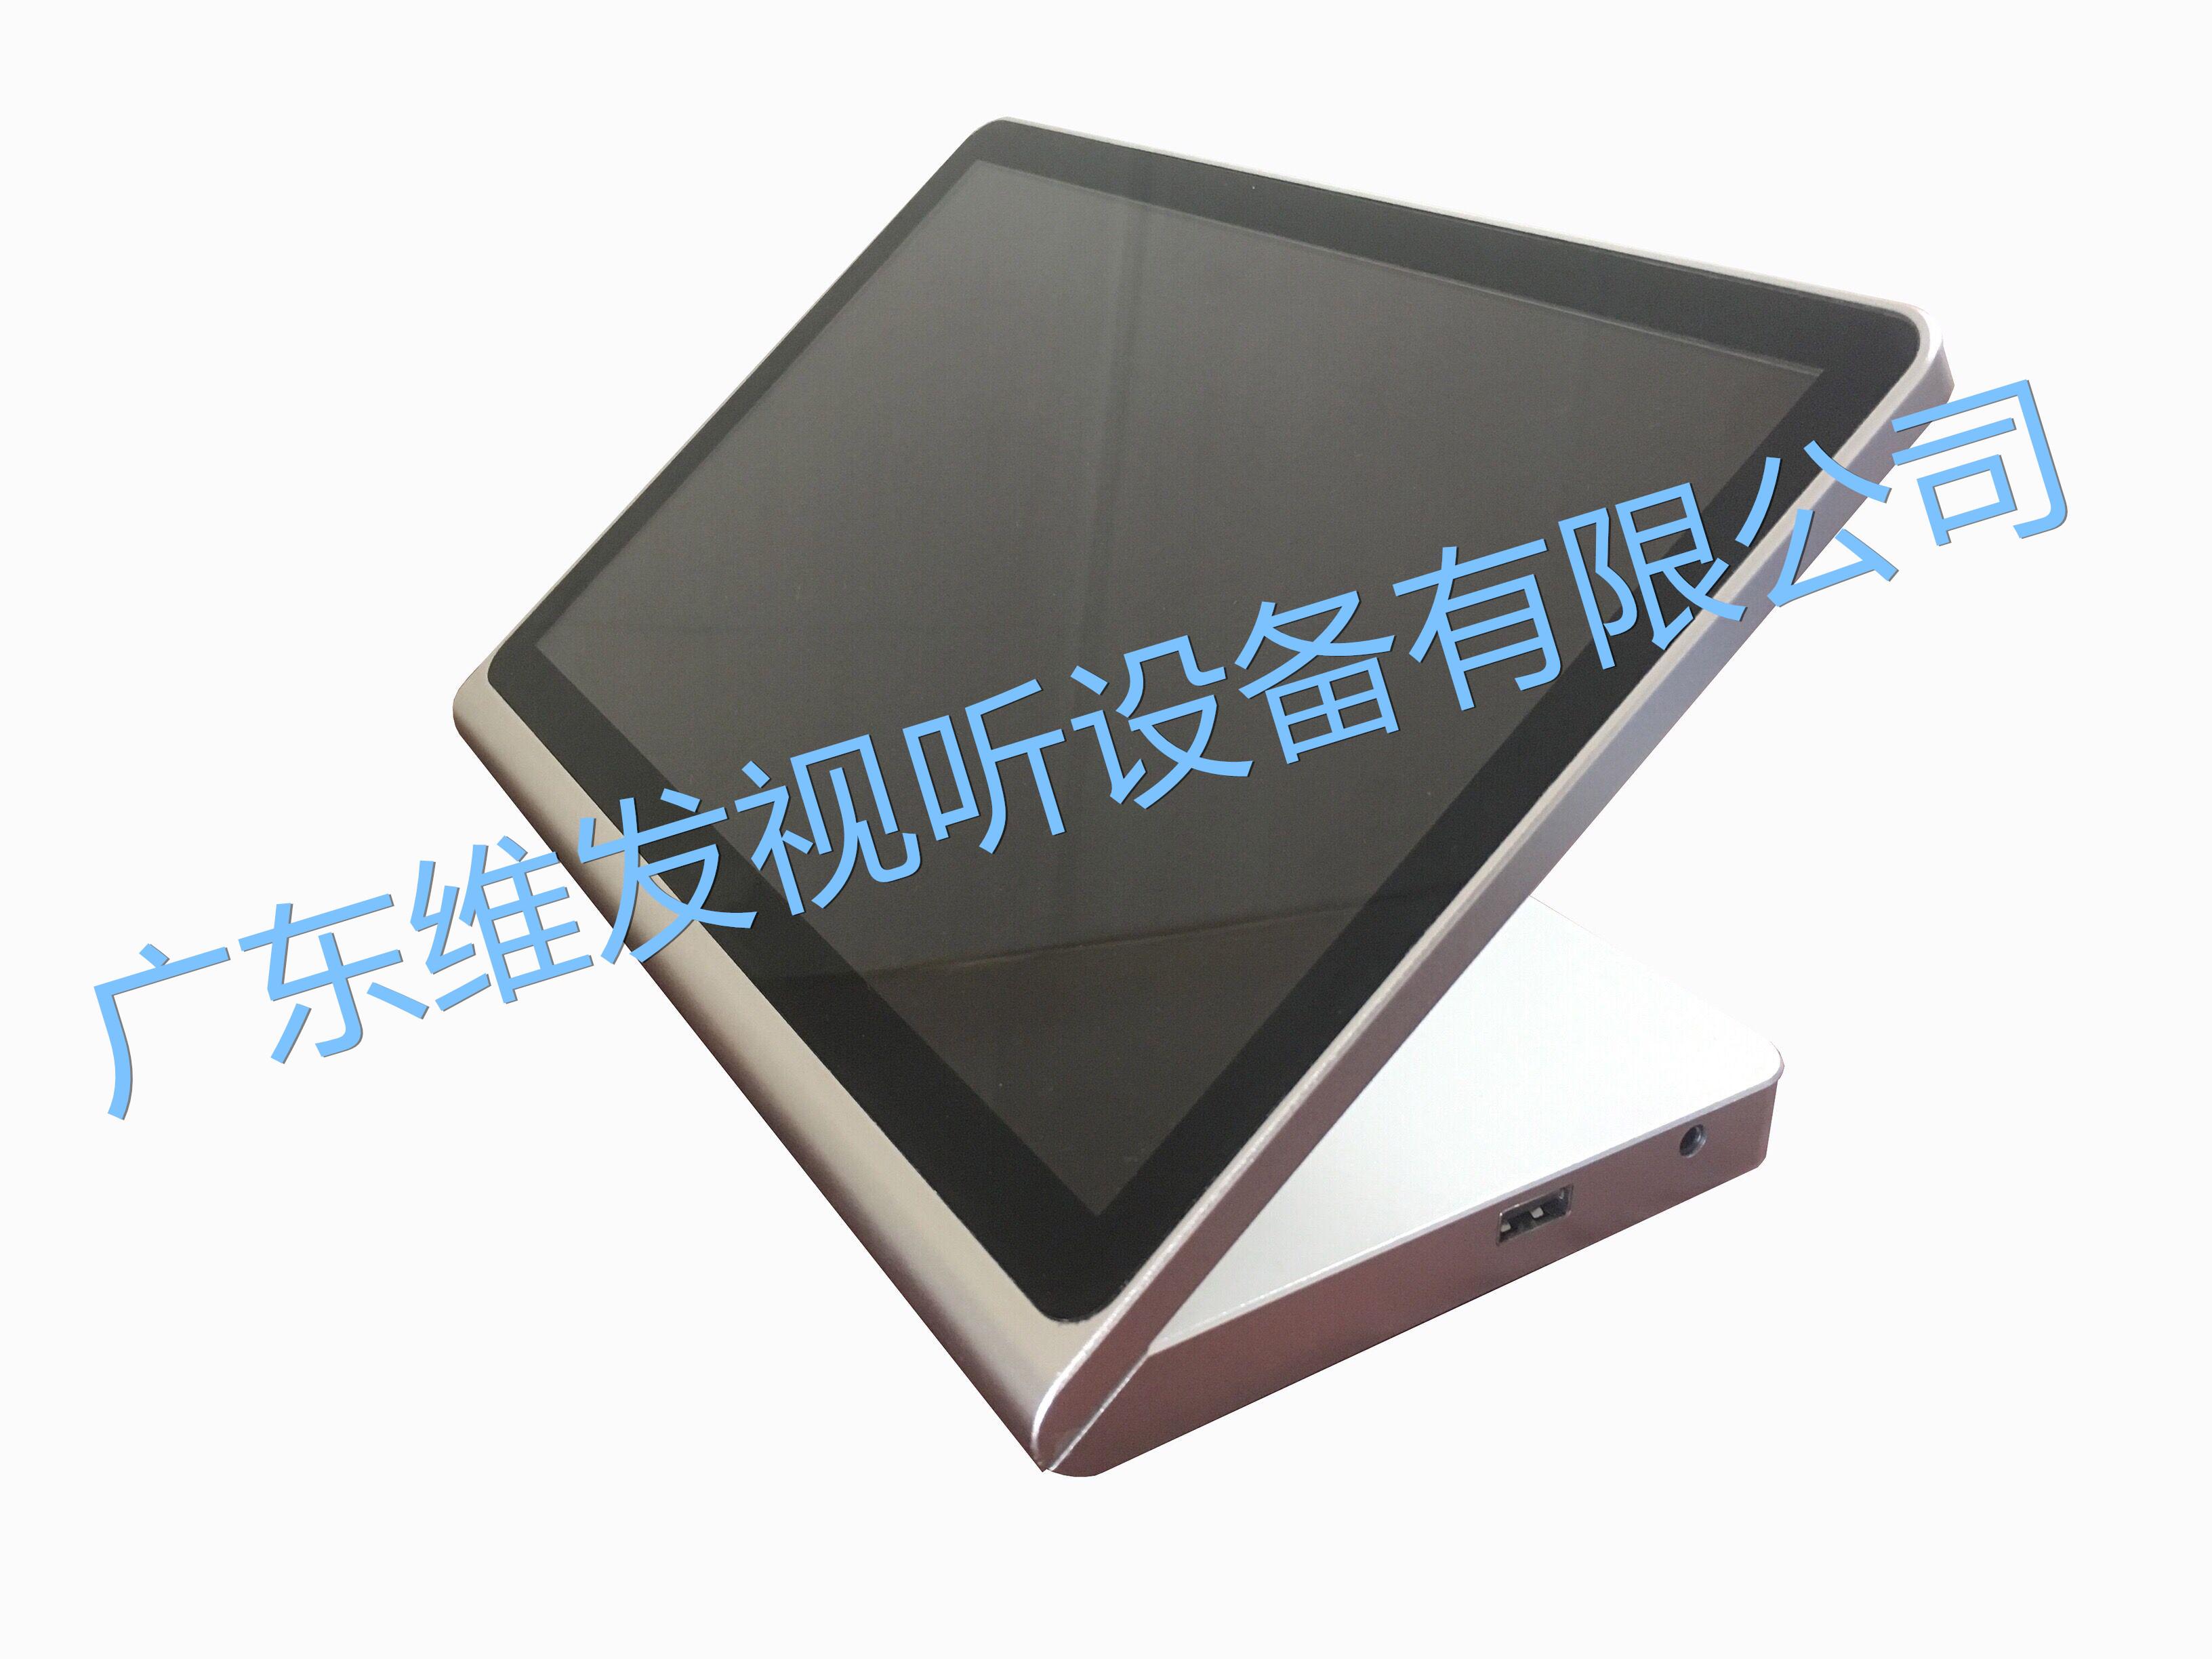 VF无纸化系列  高端桌面式终端-VF-10Z图片